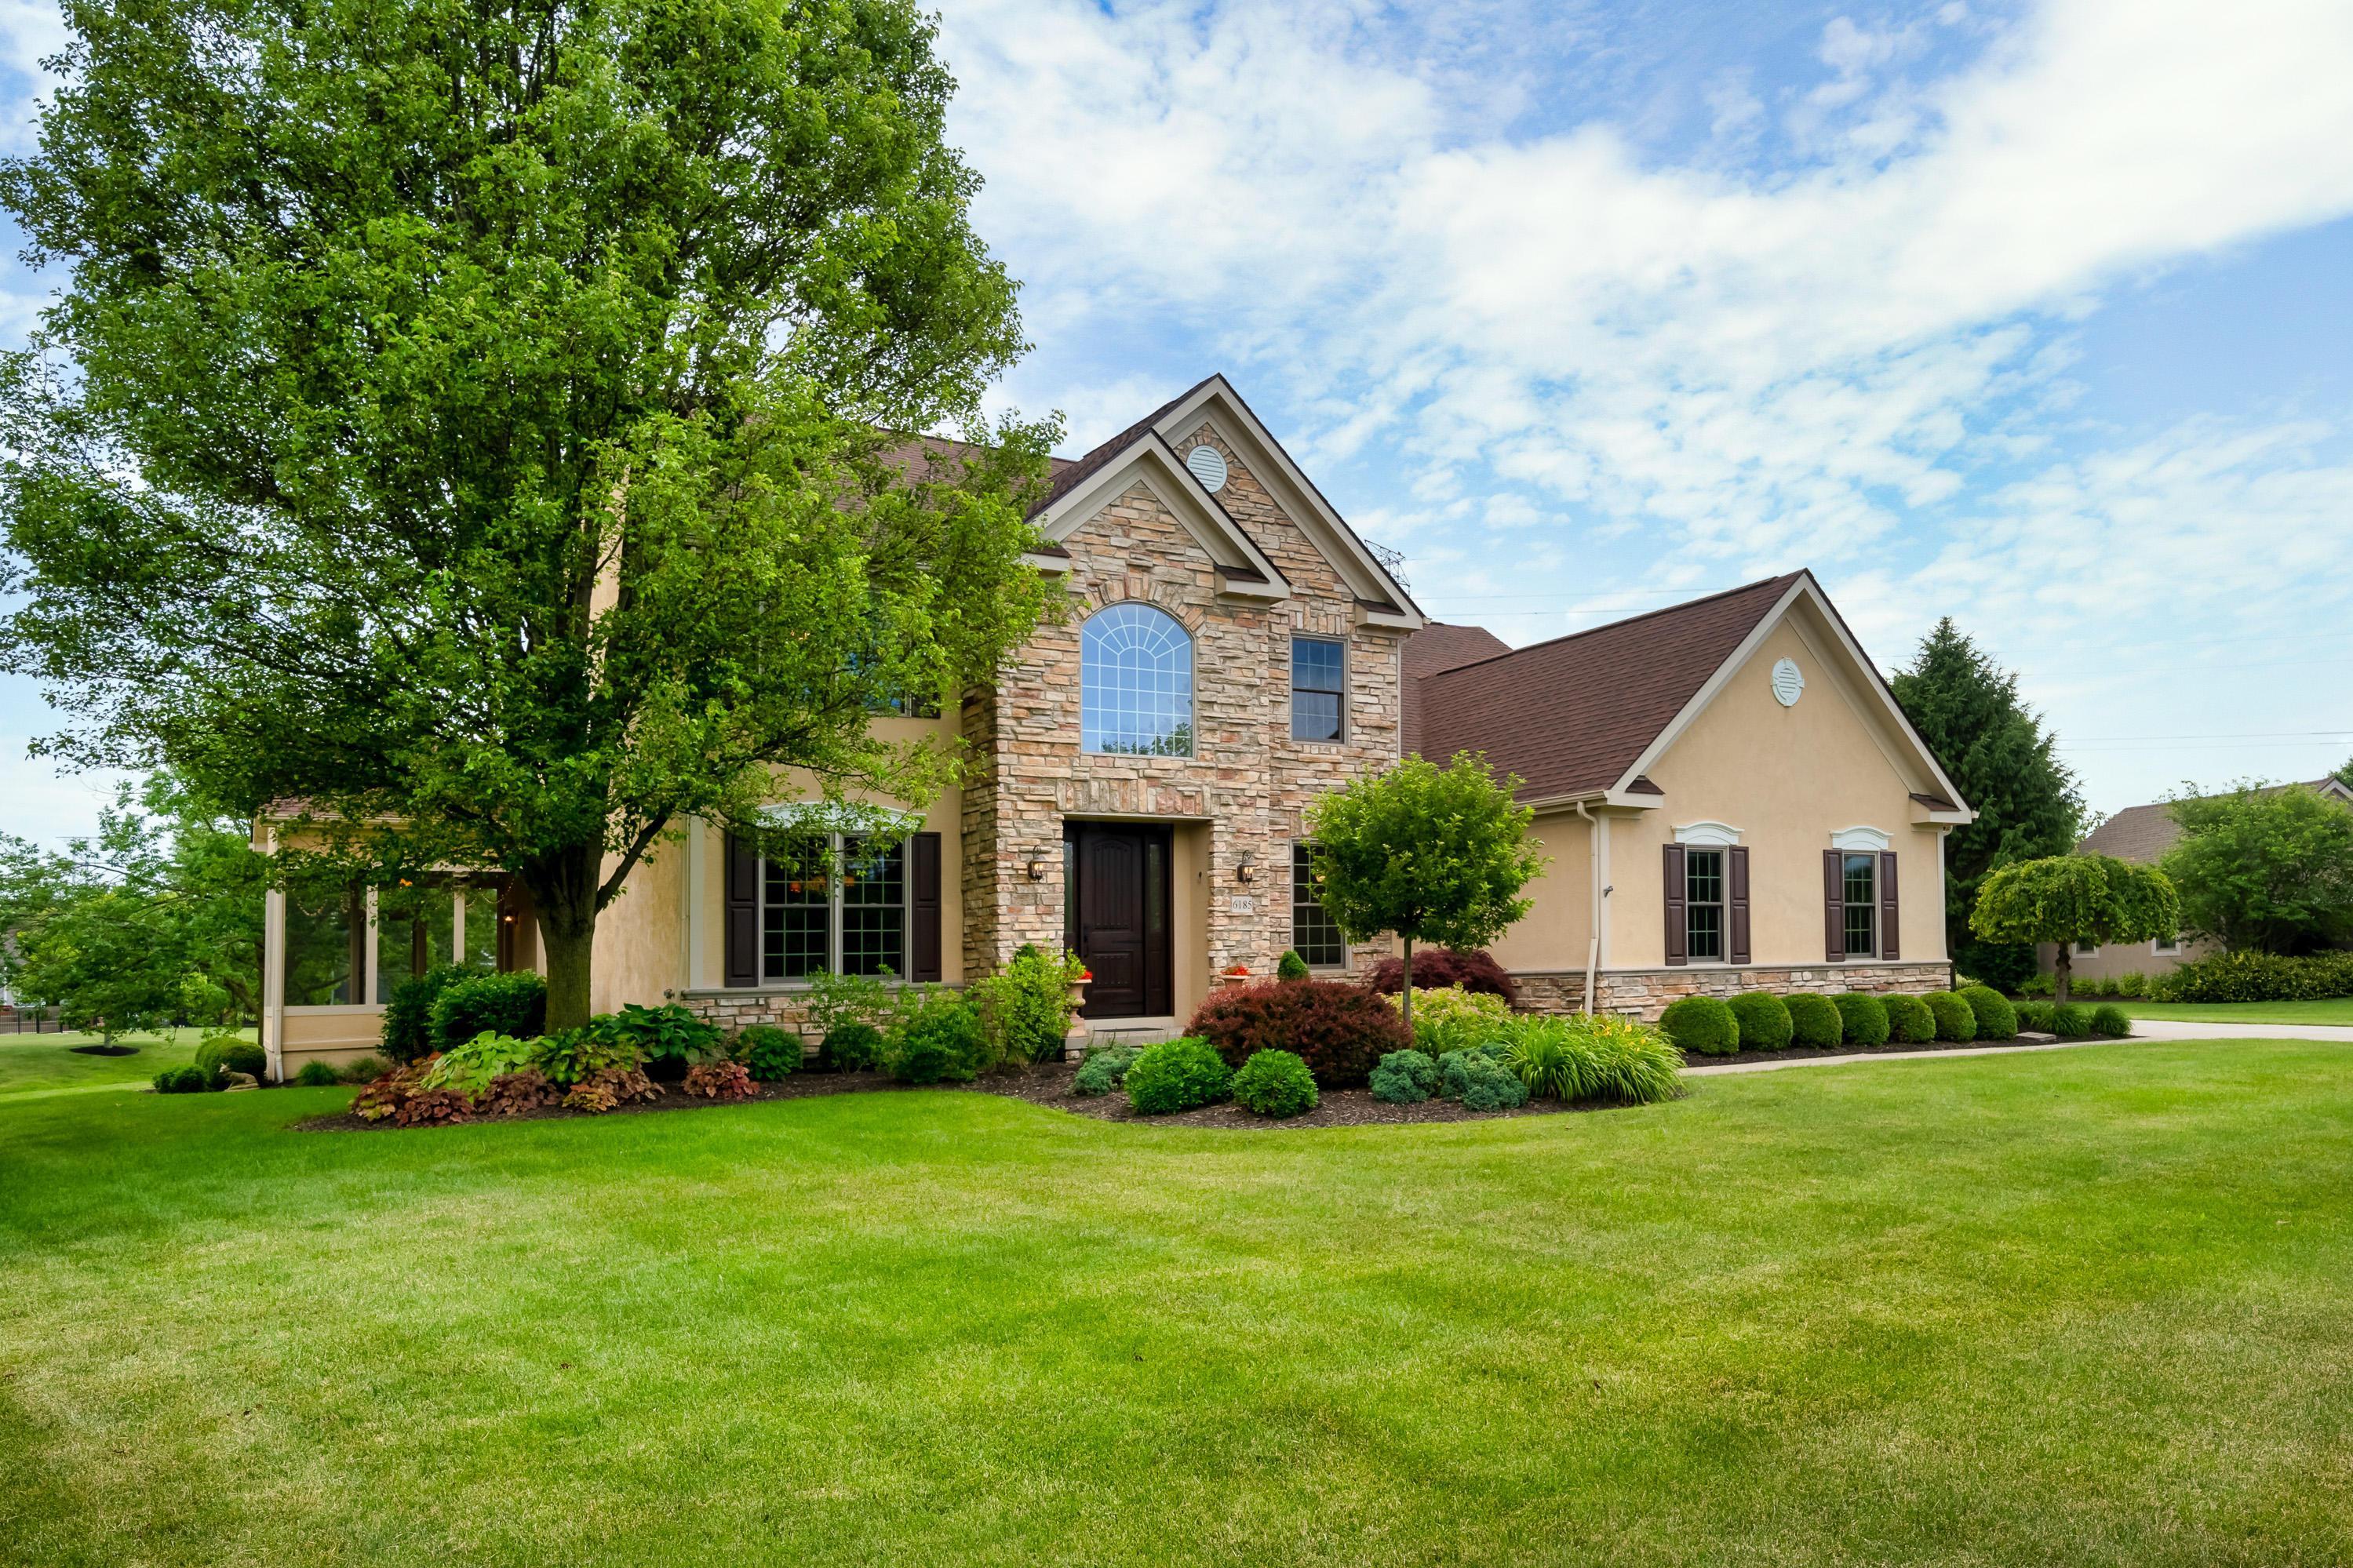 6185 Heritage Lakes Drive, Hilliard, Ohio 43026, 4 Bedrooms Bedrooms, ,3 BathroomsBathrooms,Residential,For Sale,Heritage Lakes,220019537